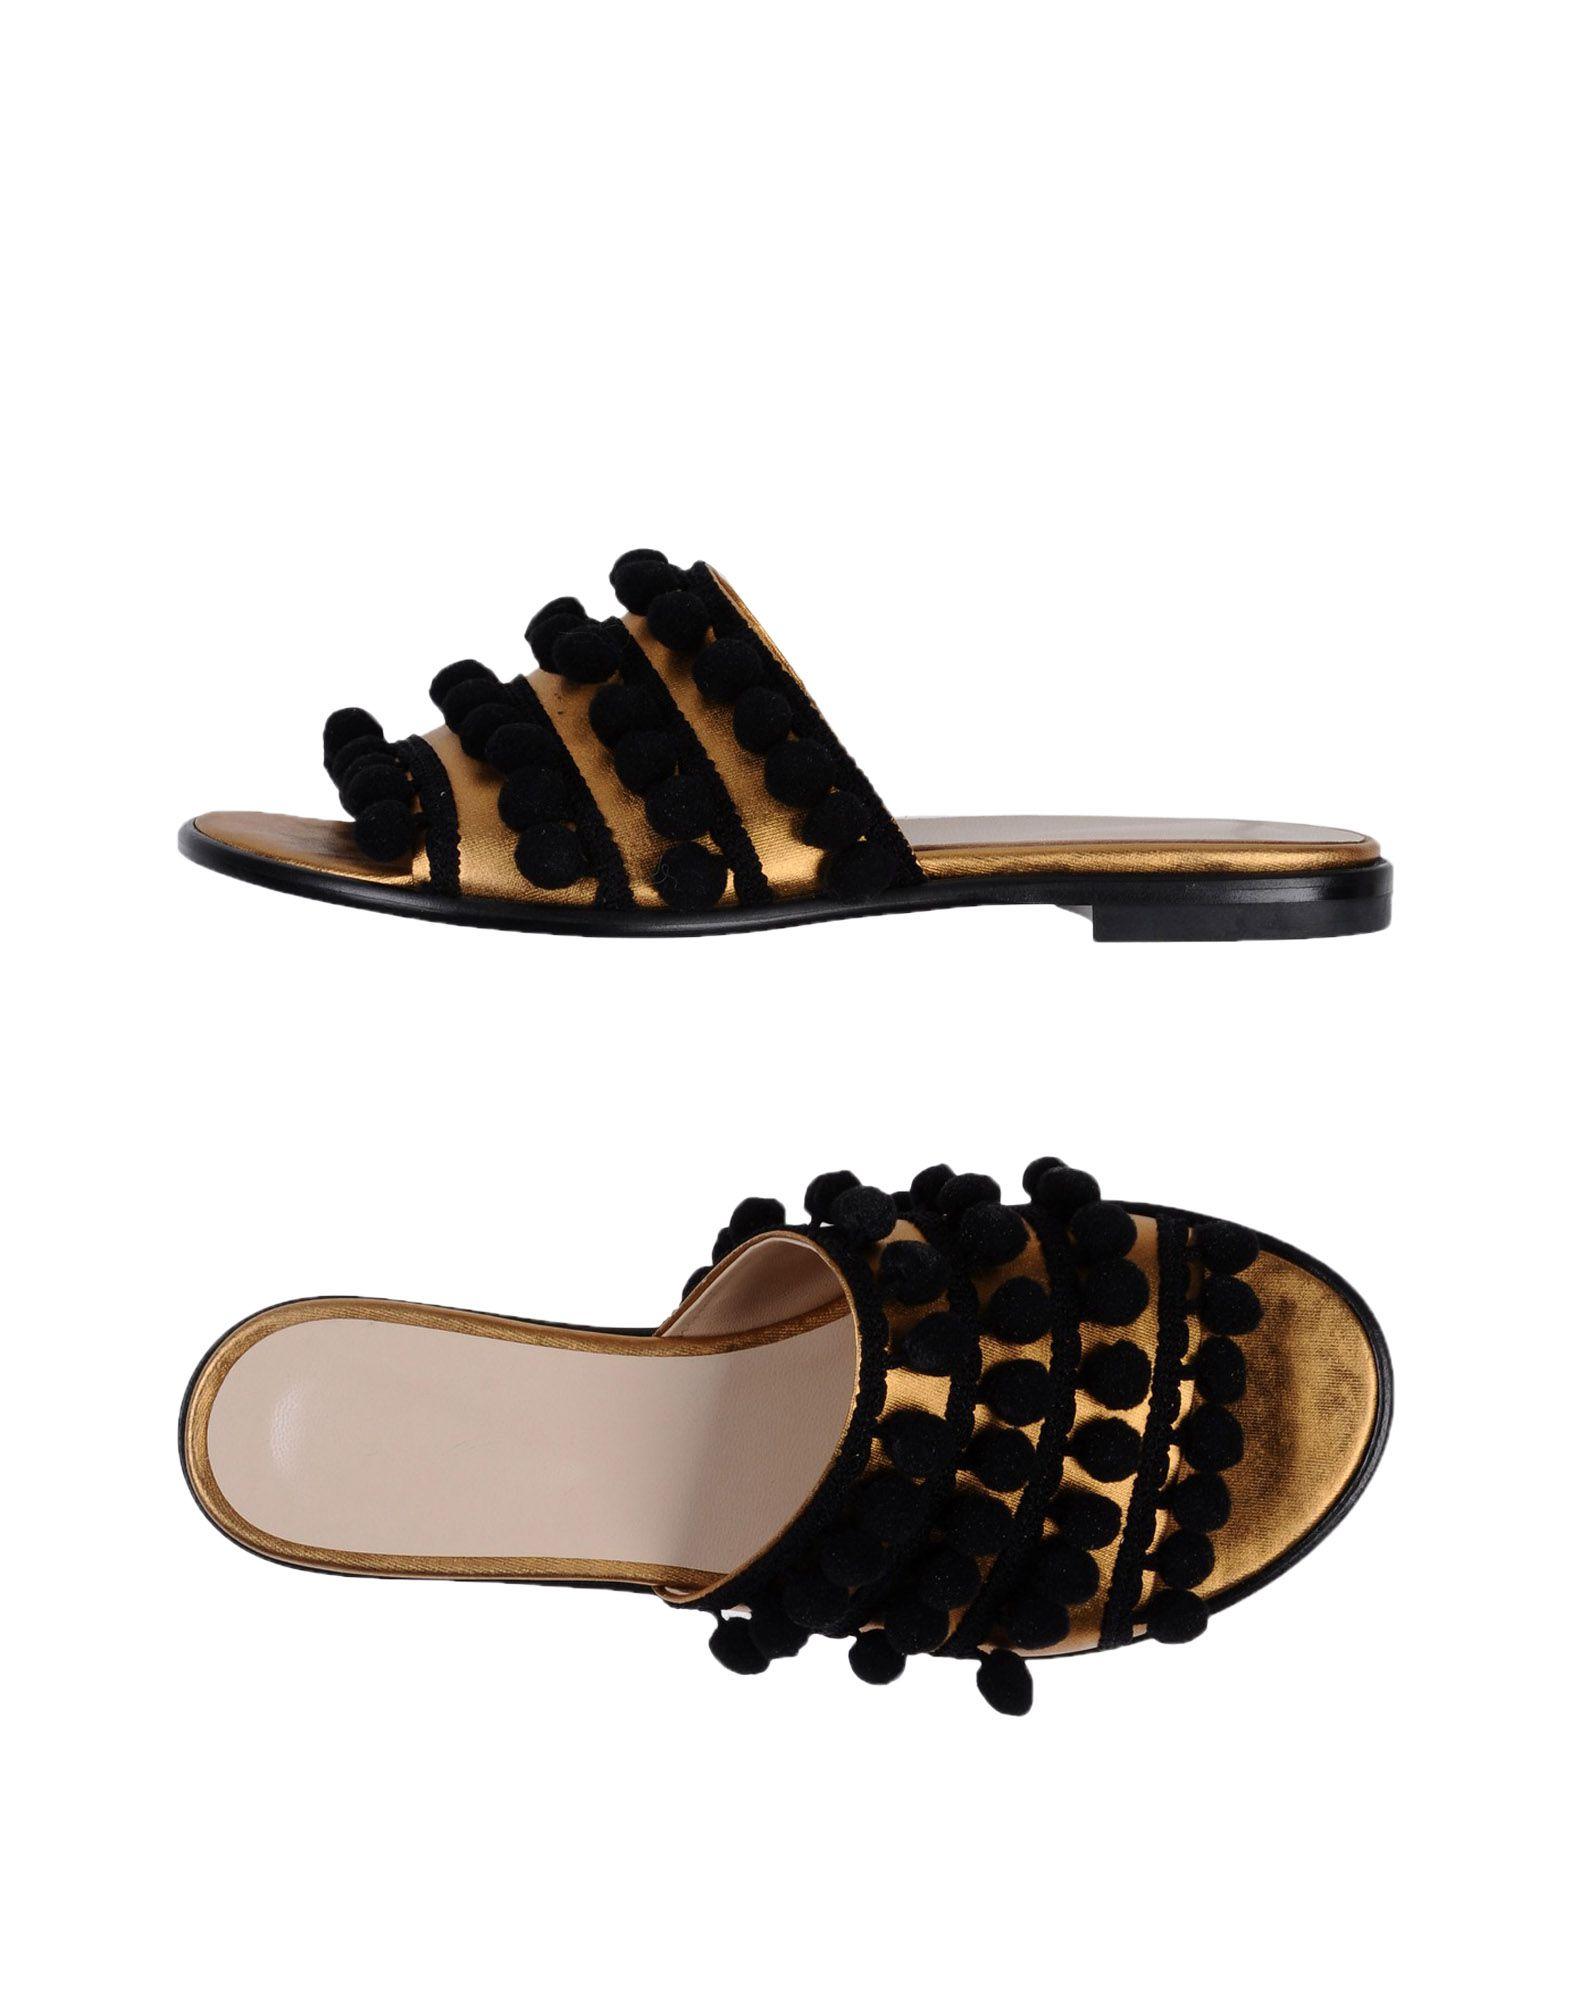 Sandales Trenta 7 Femme - Sandales Trenta 7 sur